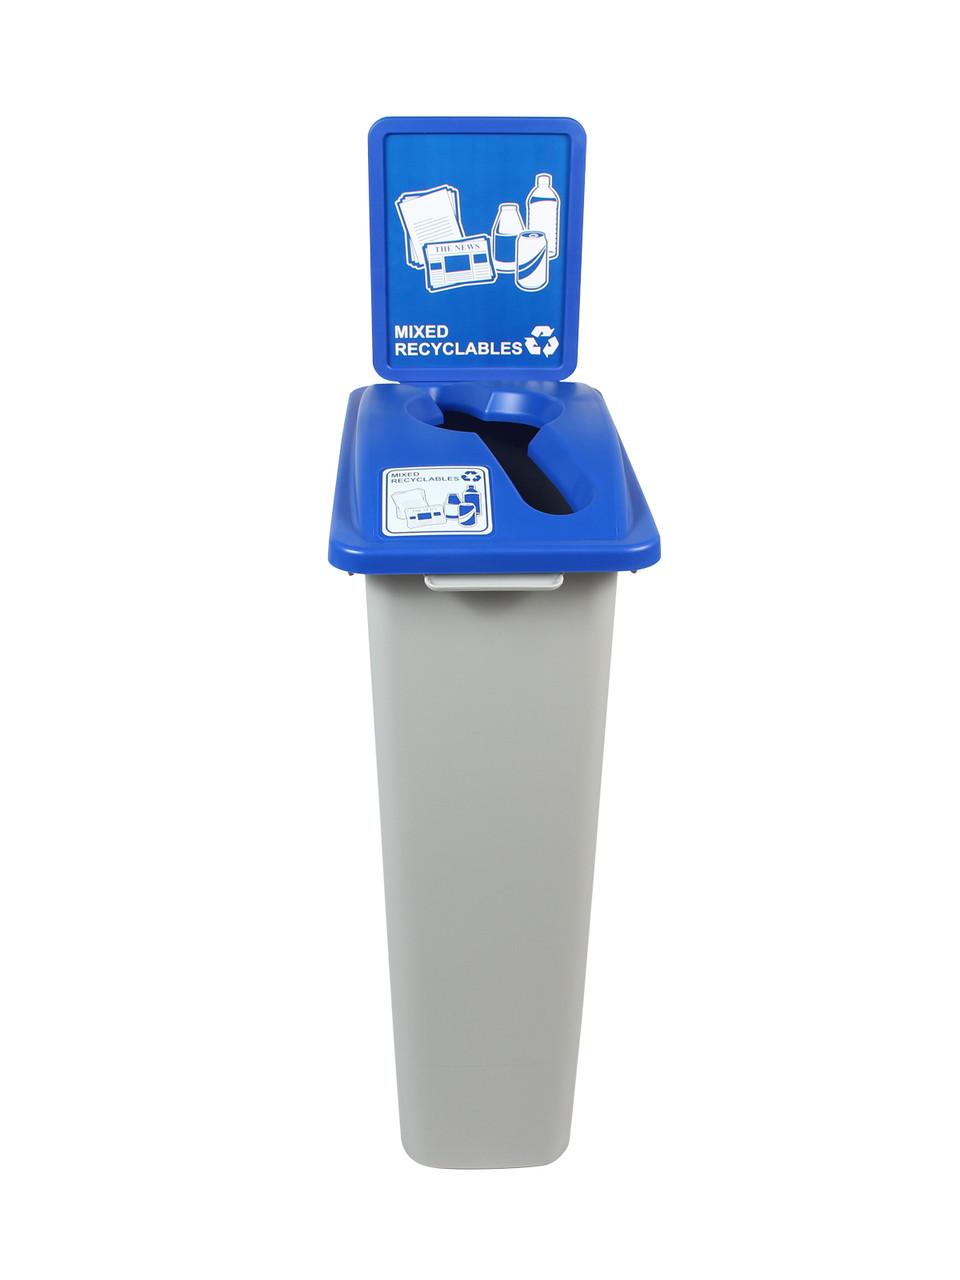 23 Gallon Simple Sort Single Home & Office Recycling Bin WW2 (5 Colors)